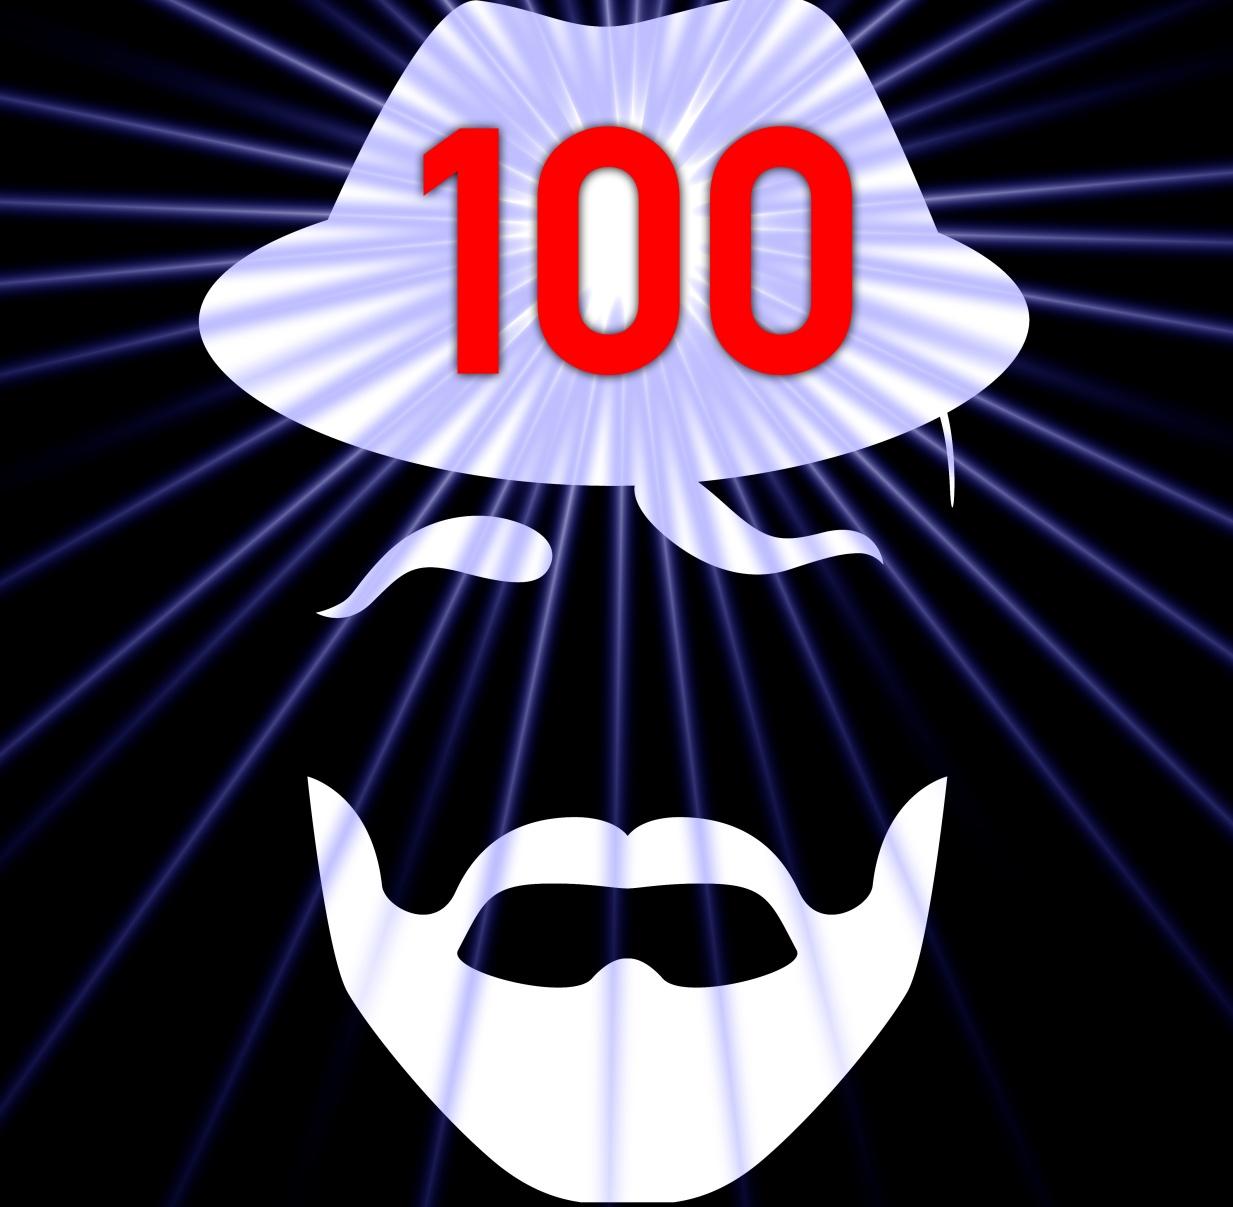 seppo100